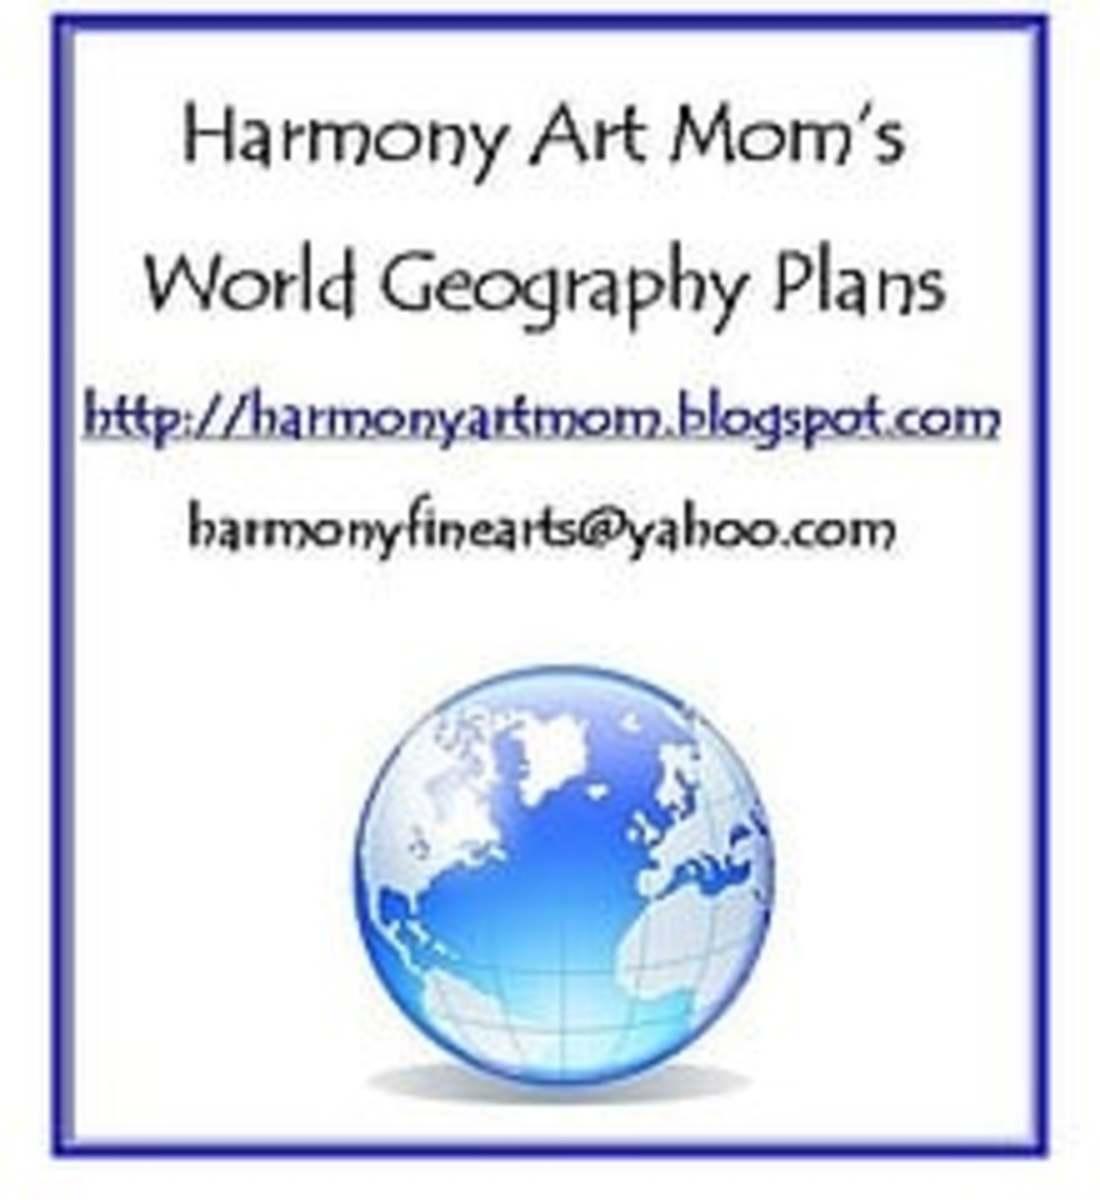 harmonyartmomeleventhgrade